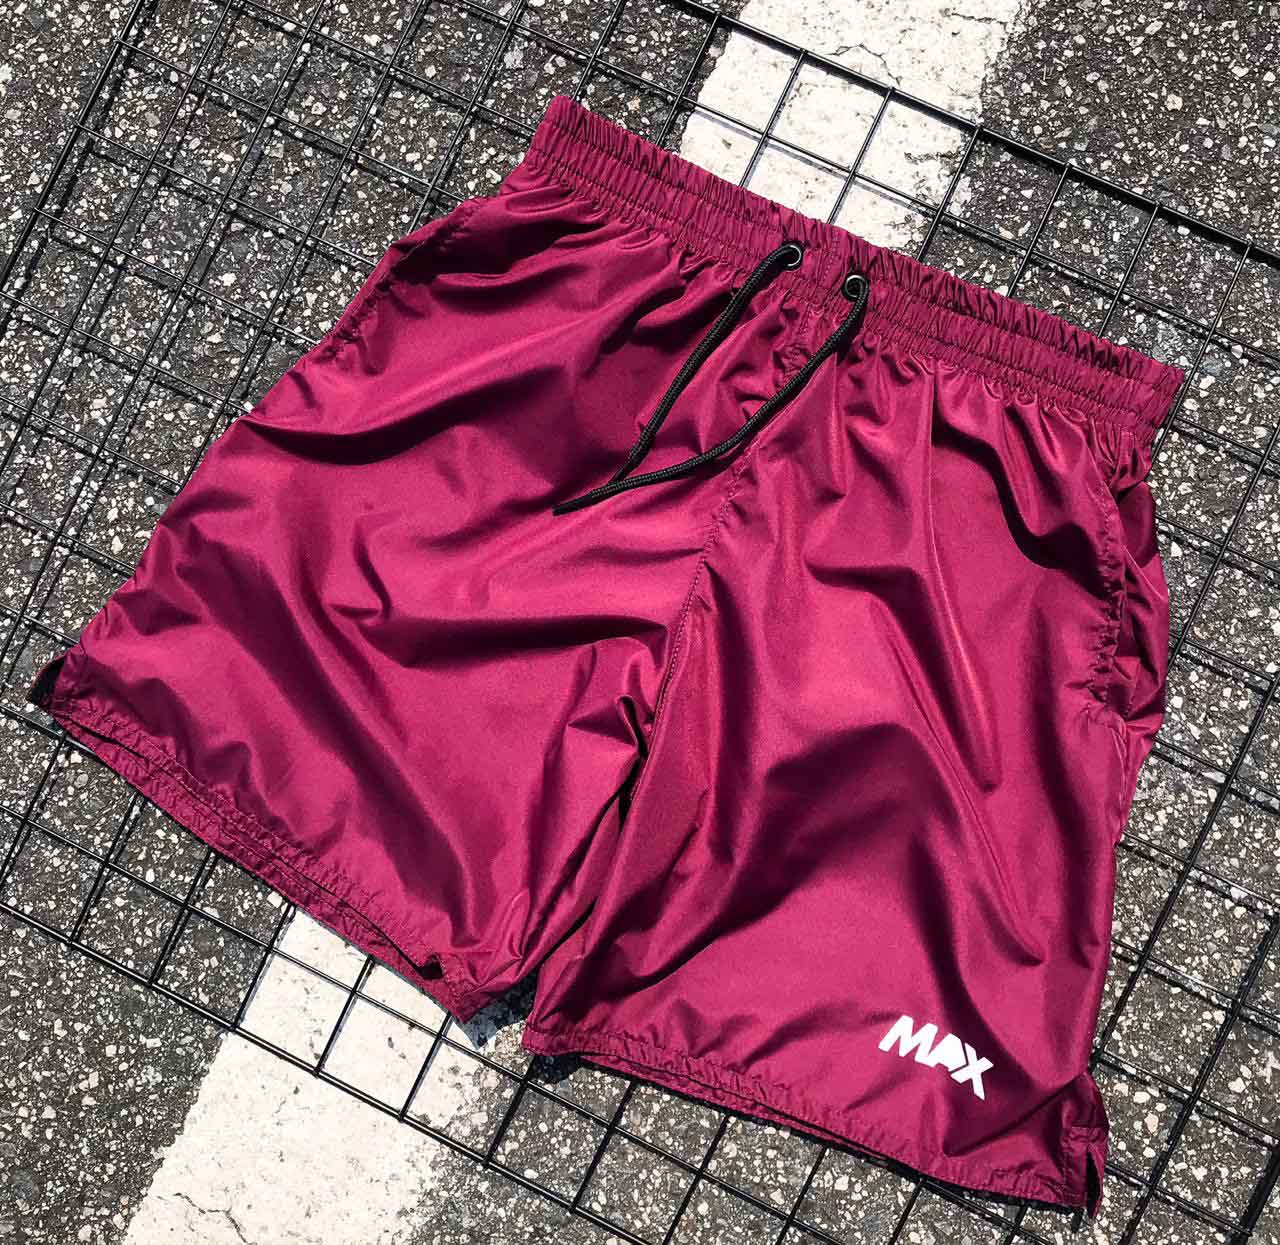 Kit 4 Shorts Masculino Max